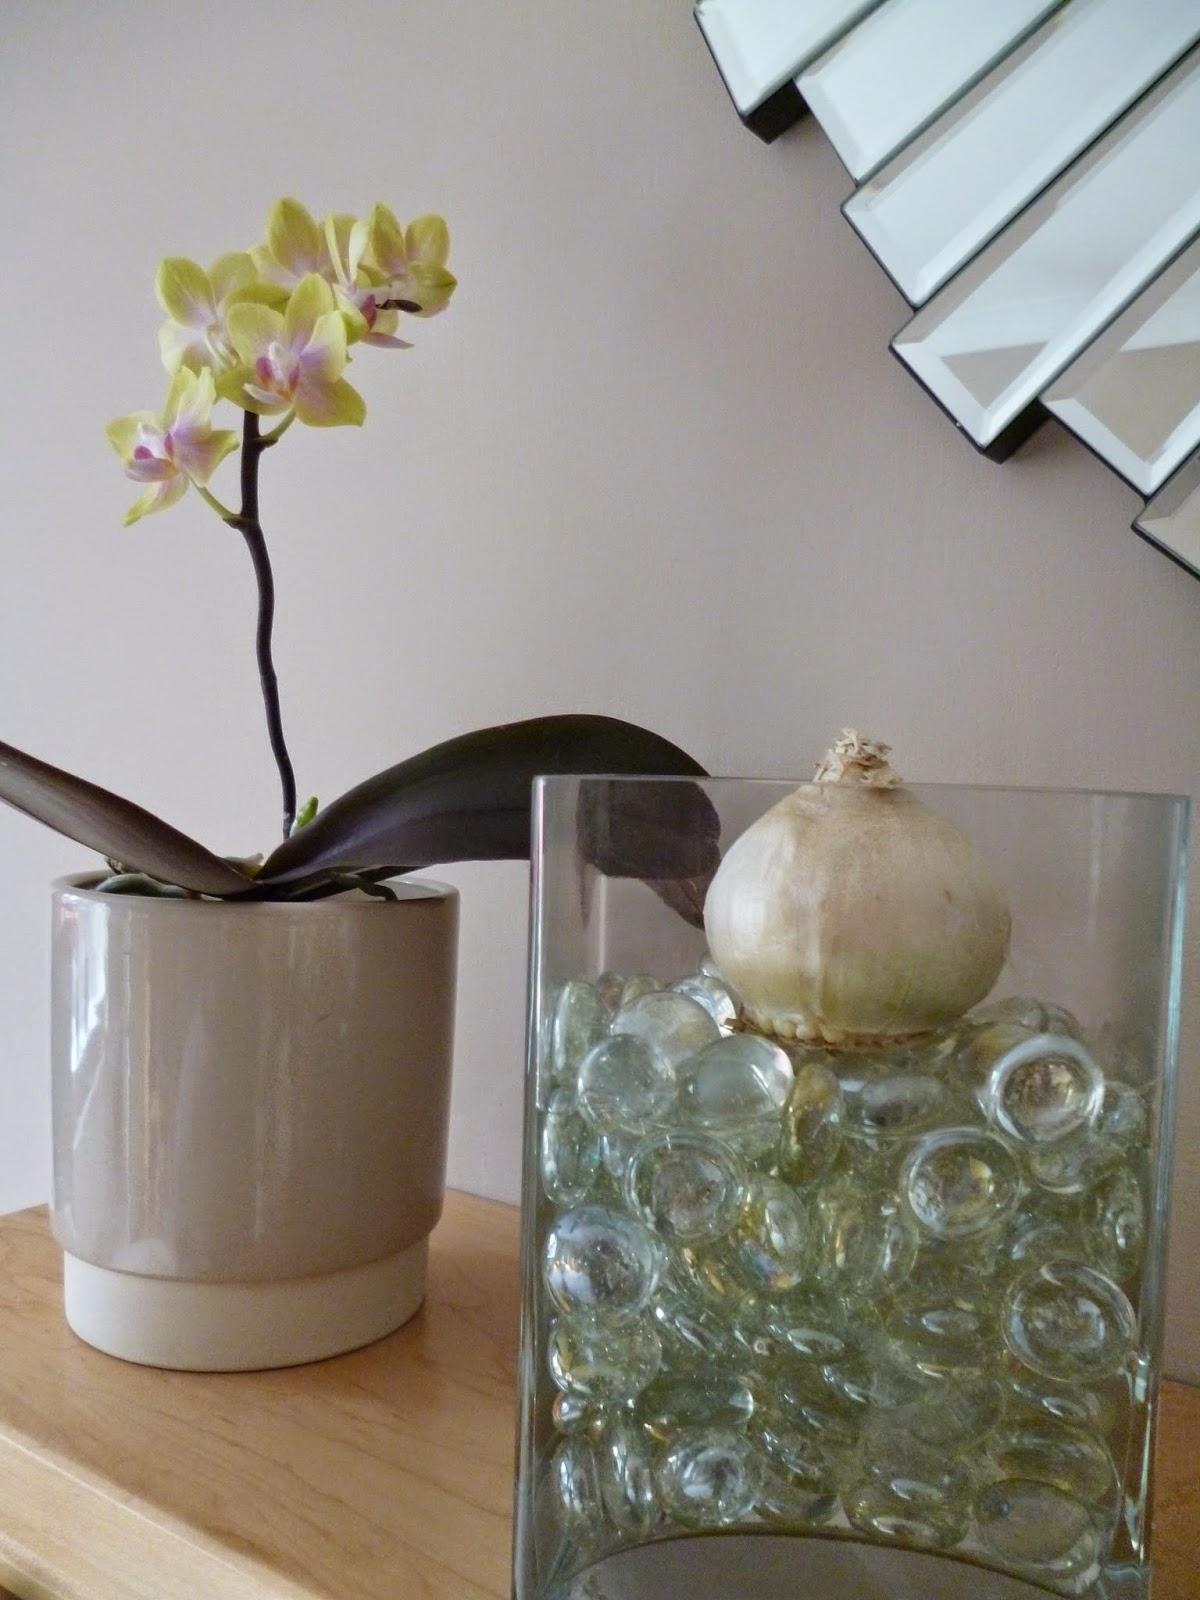 How to grow Hyacinth bulb vase for Christmas